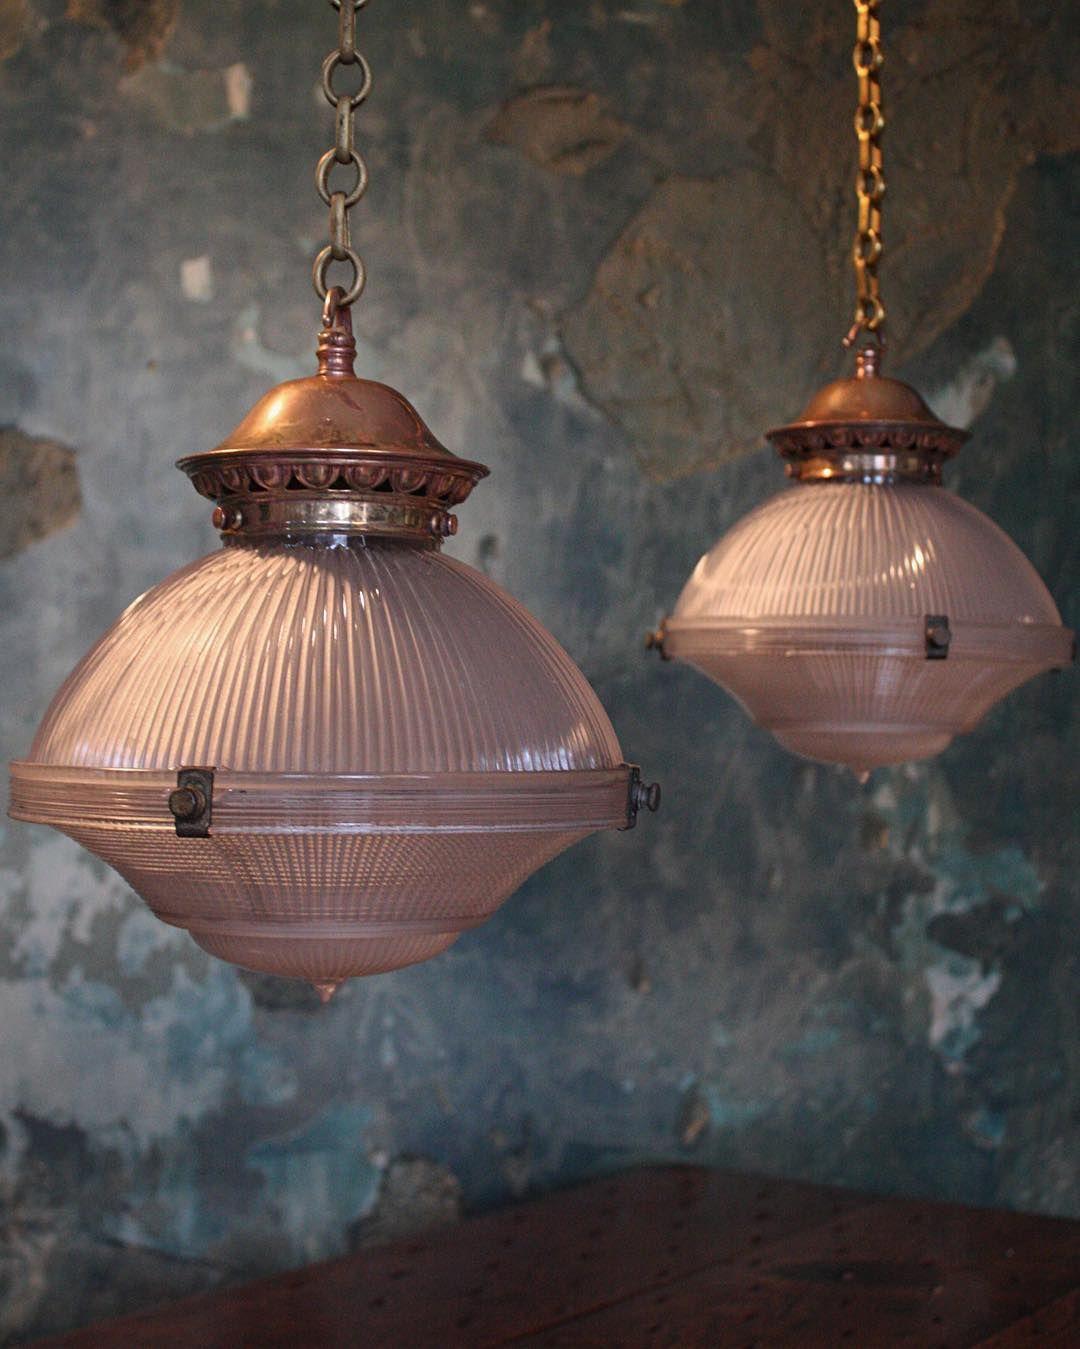 Pair of three part prismatic Holophane pendants #holophane #lighting #interior #decorative # & Pair of three part prismatic Holophane pendants #holophane #lighting ...